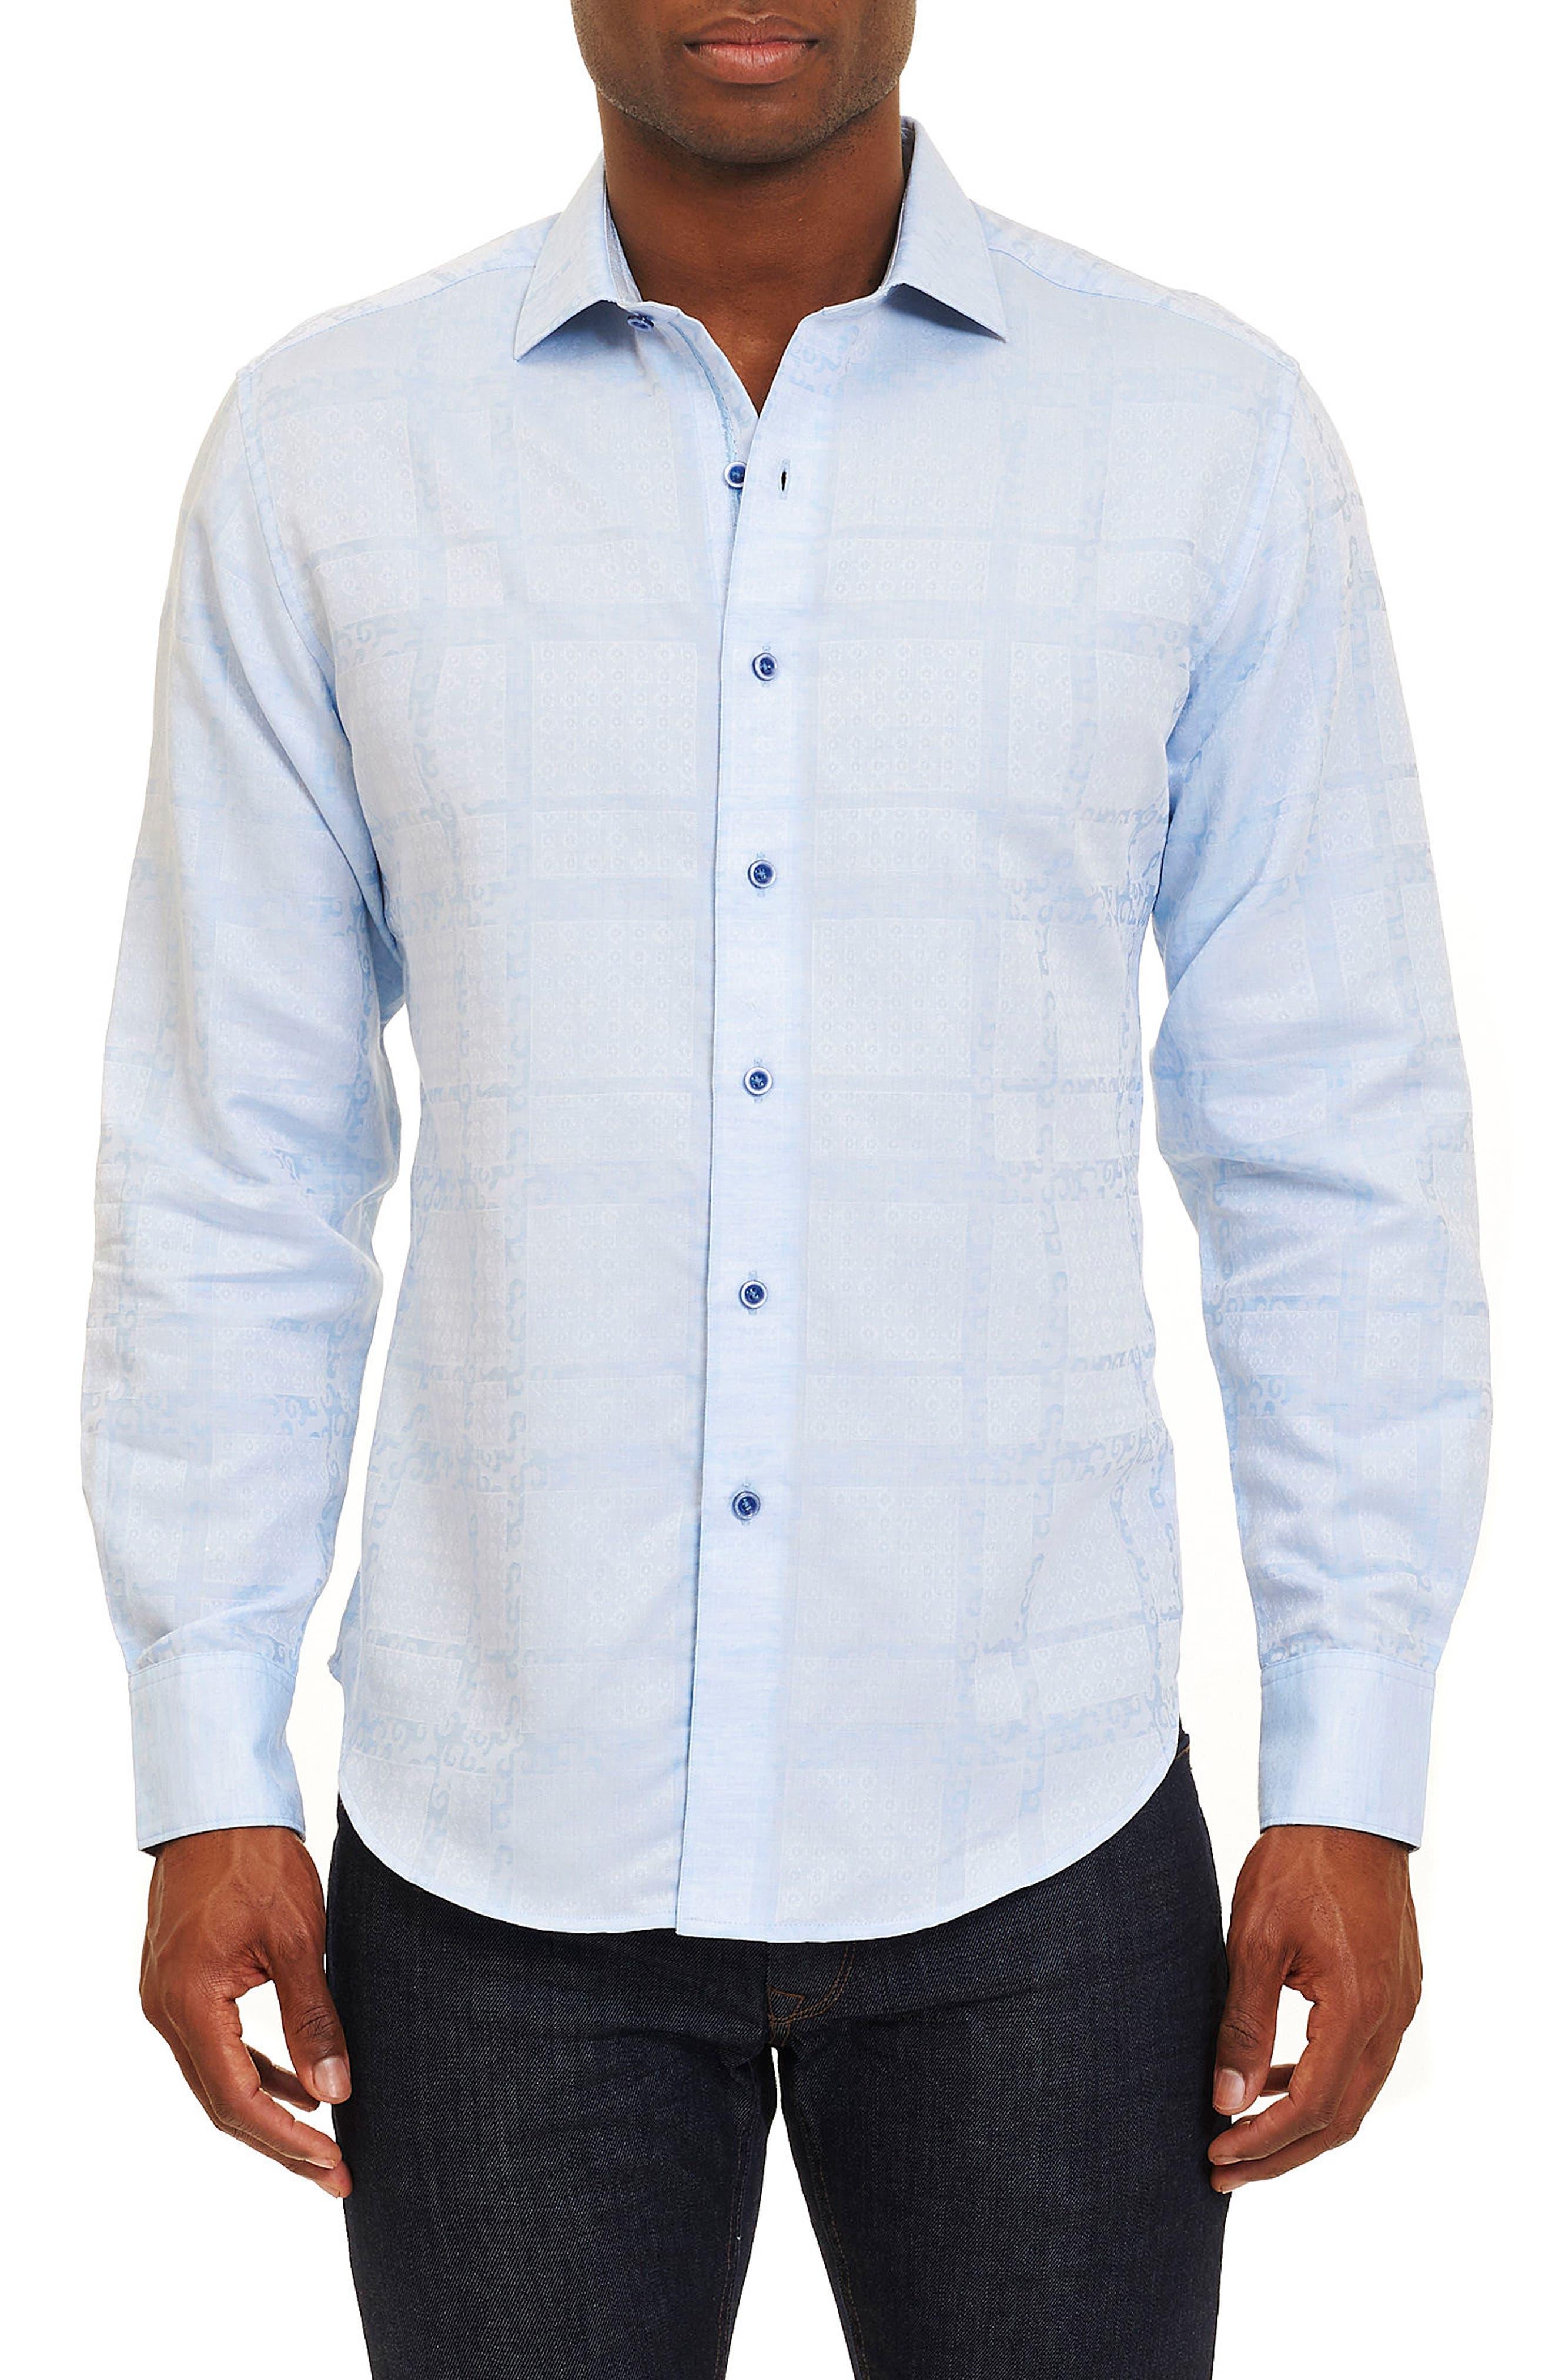 Morley Sport Shirt,                         Main,                         color, Light Blue